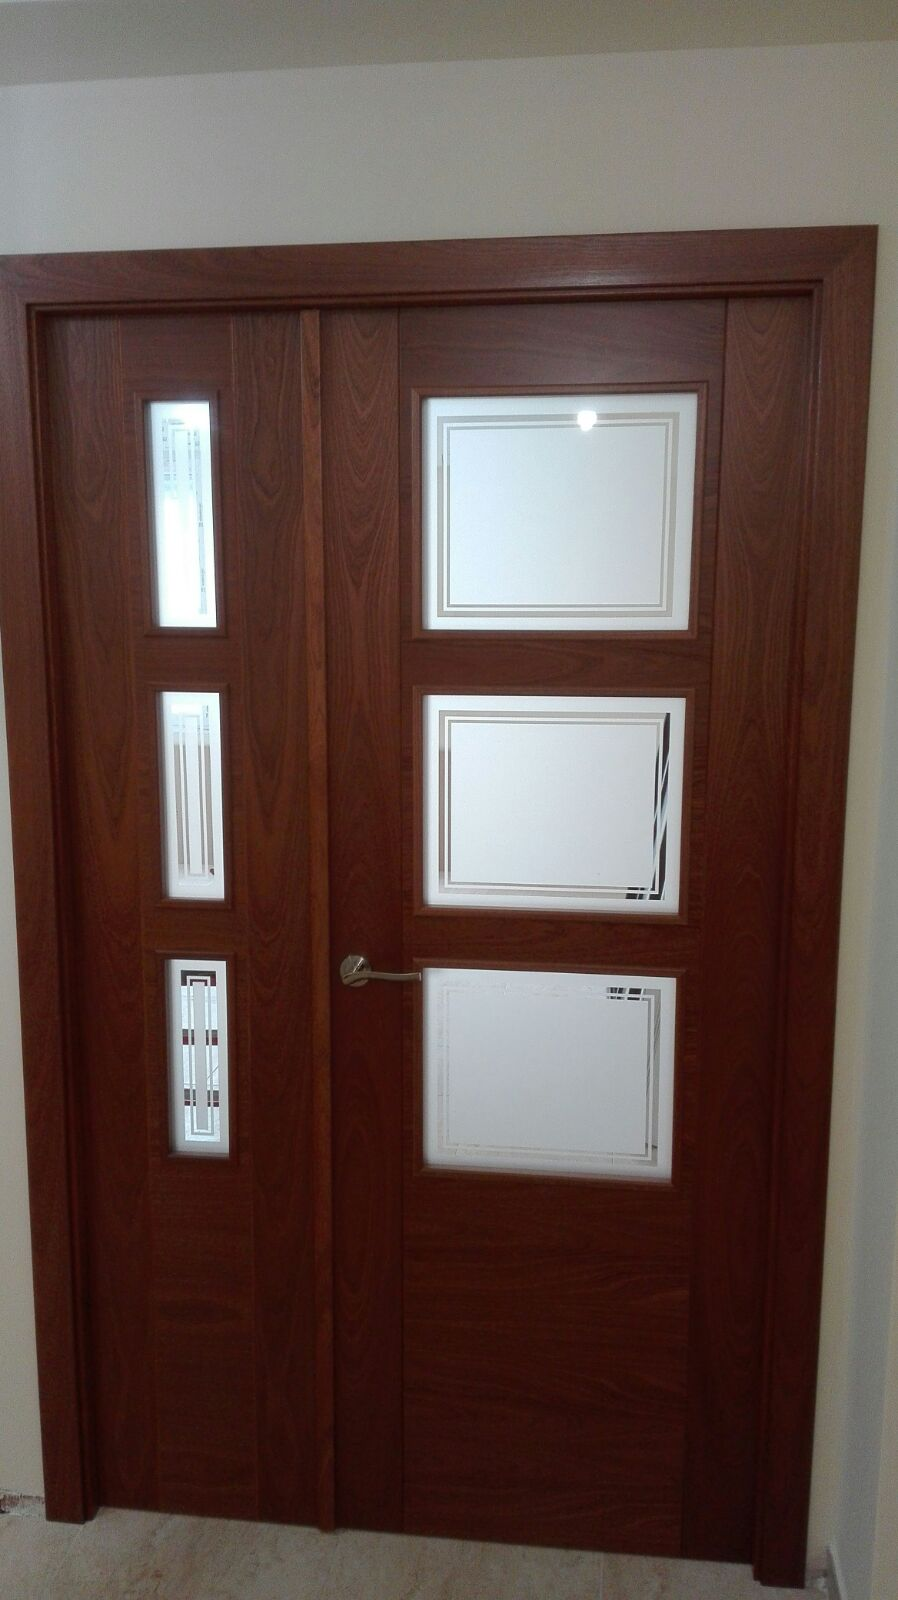 Puerta blanca con cristal simple puerta corredera cristal - Cristal puerta salon ...